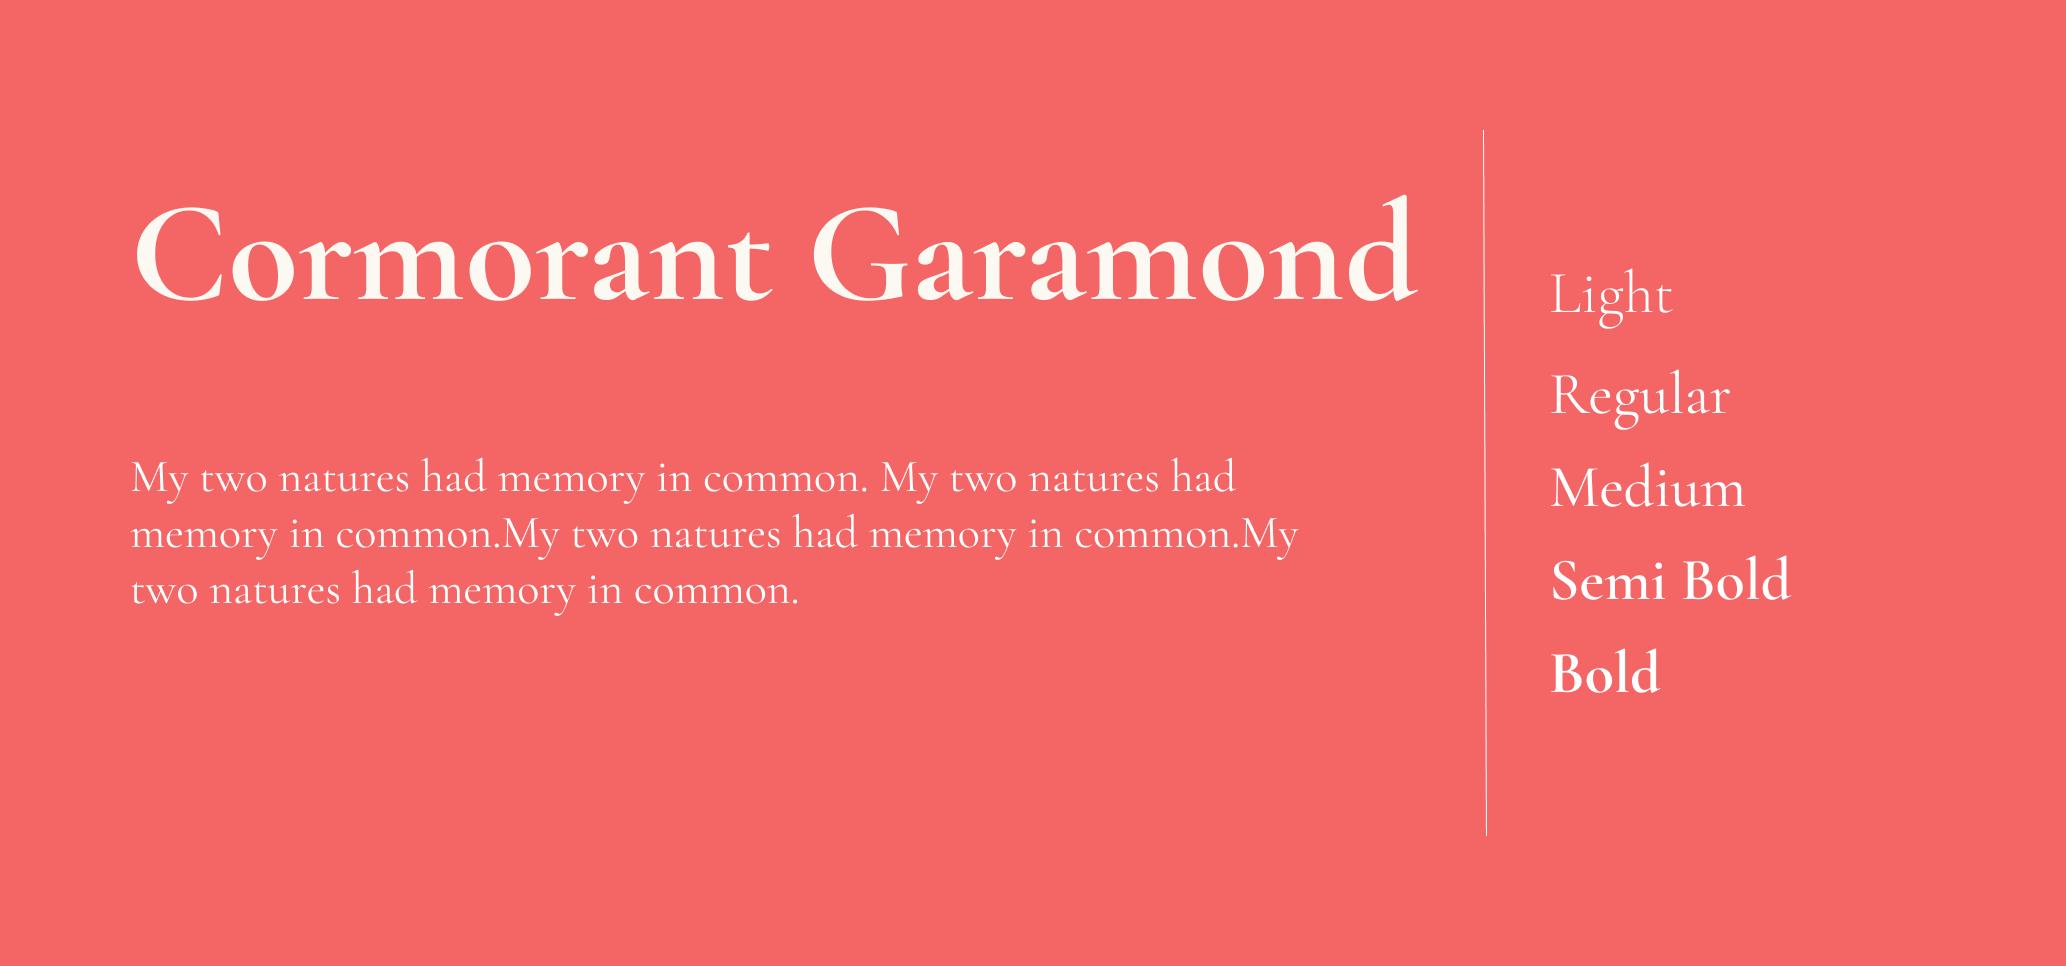 Cormorant Garamond font